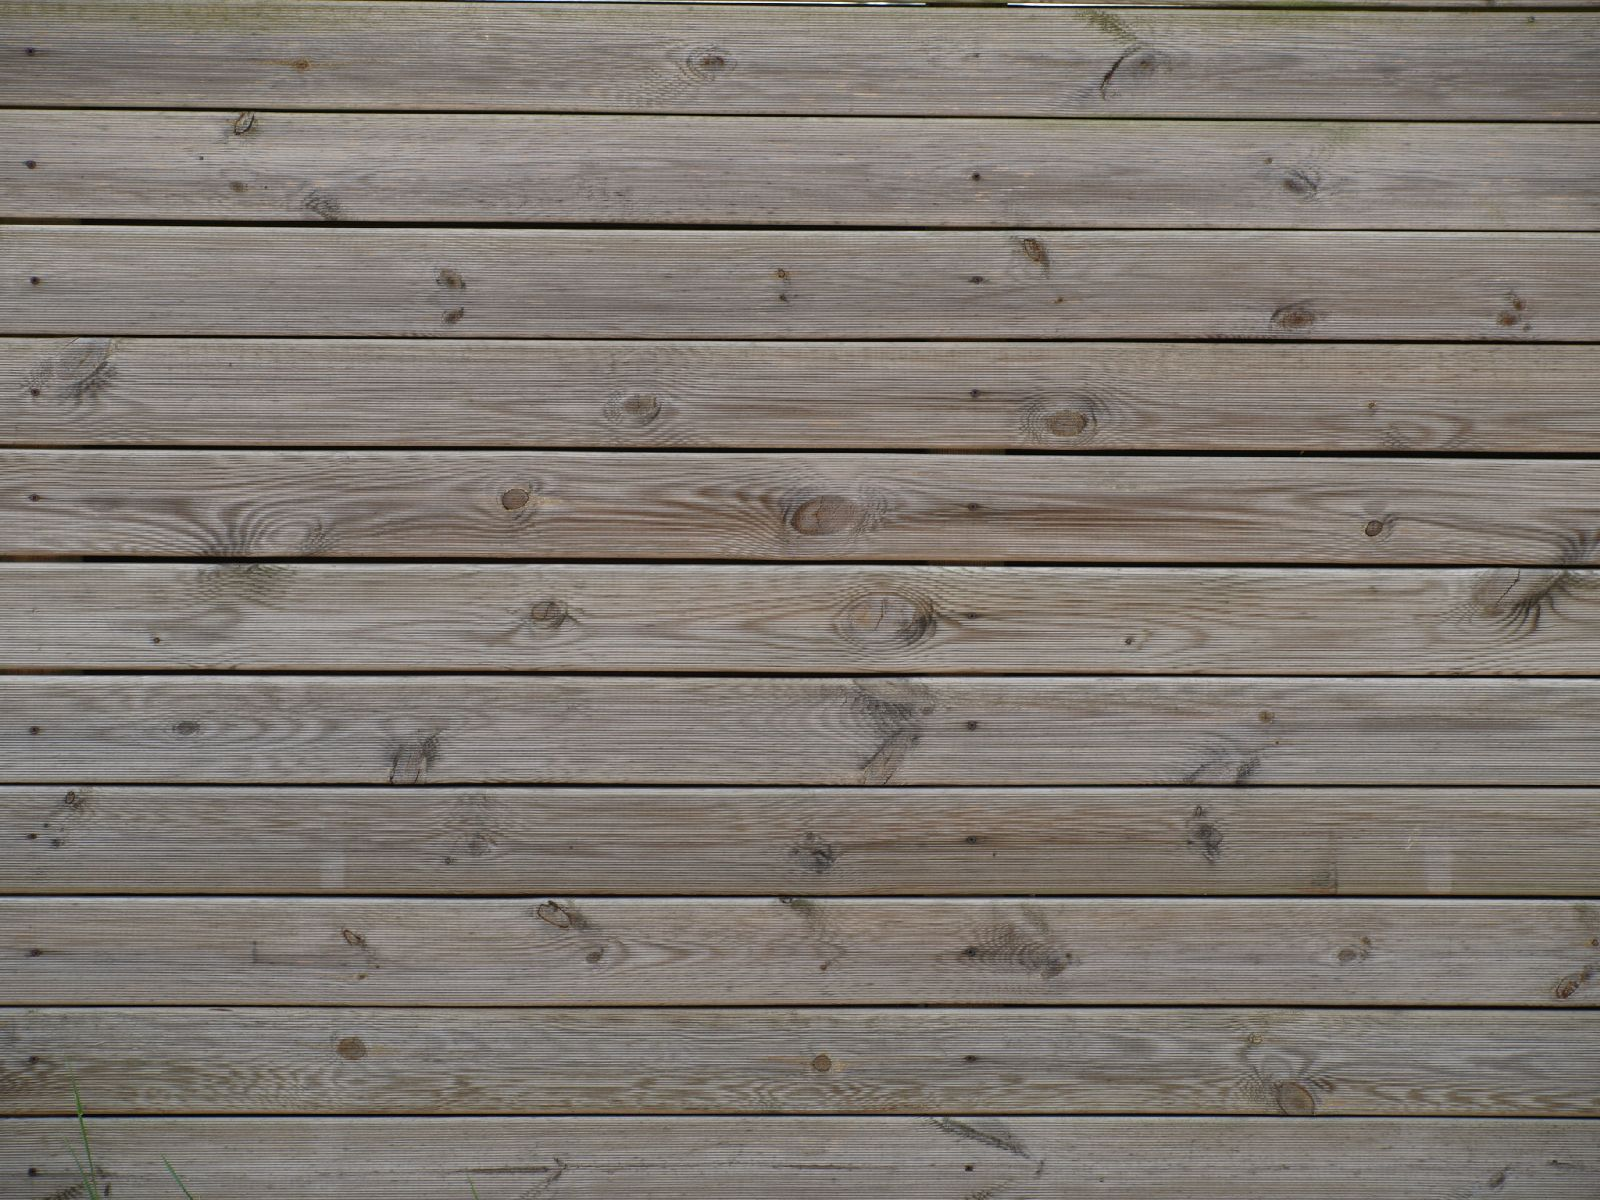 Wood_Texture_A_P6013247